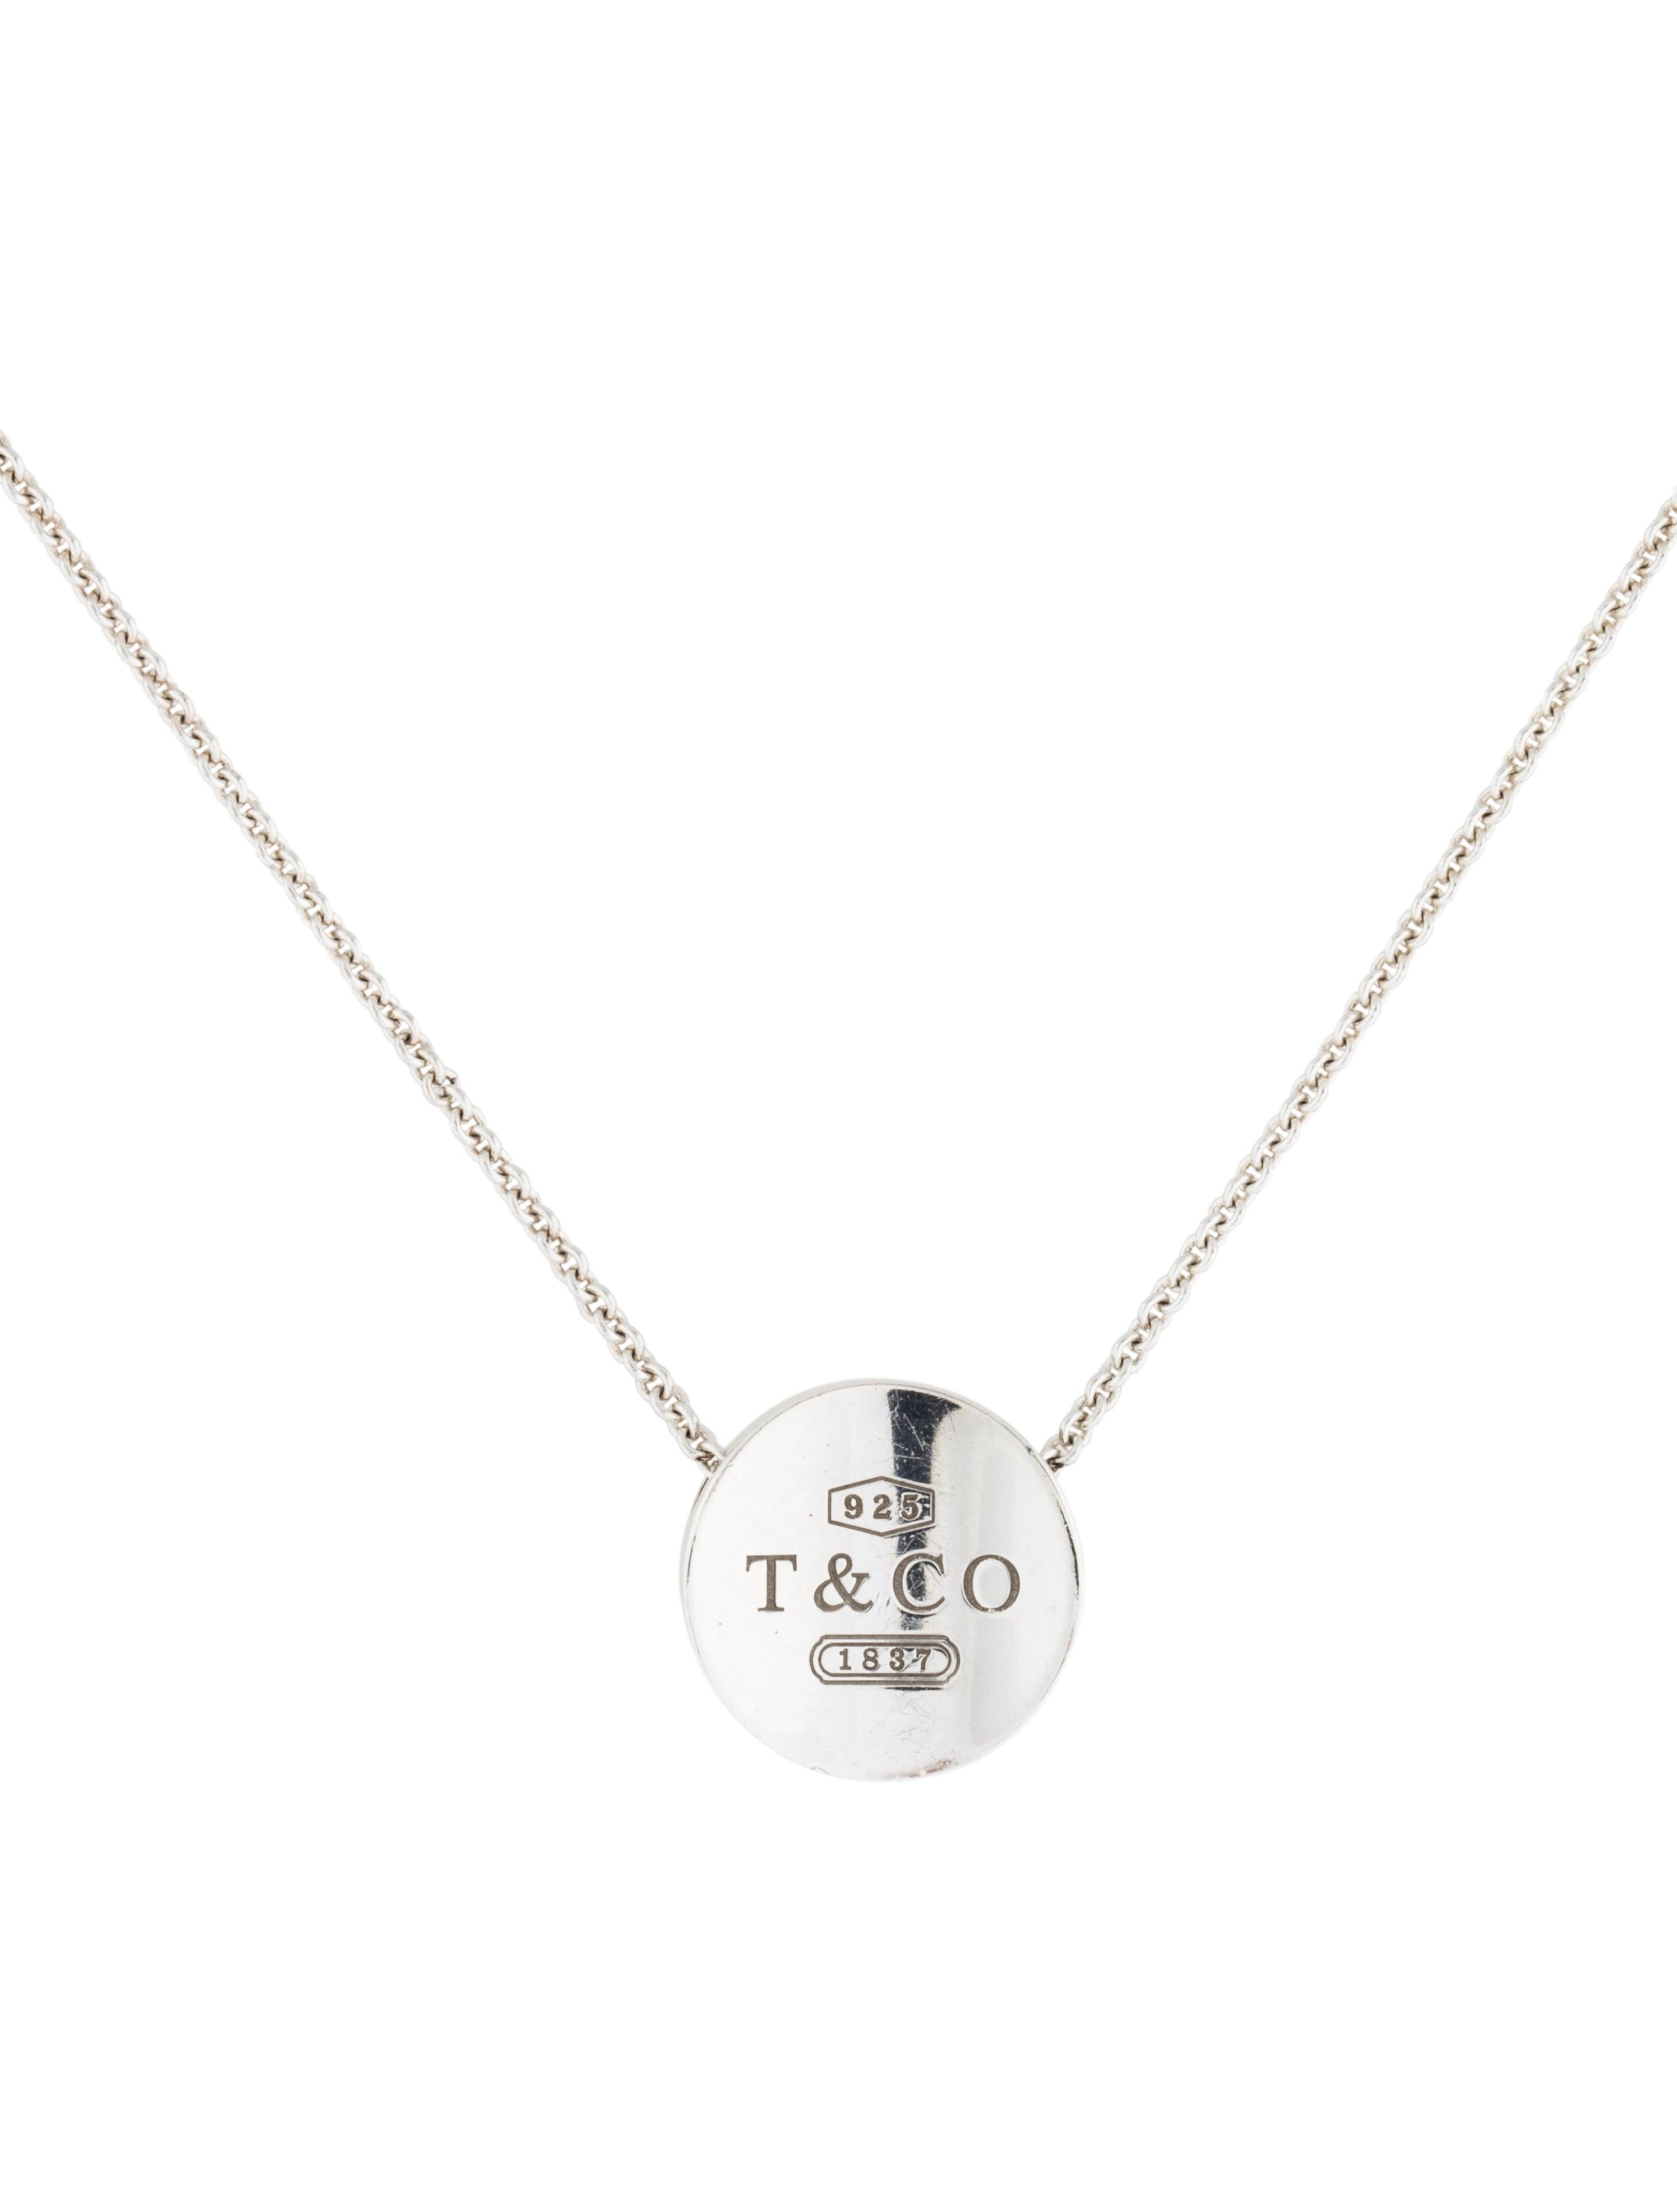 Tiffany co 1837 concave pendant necklace necklaces tif32683 1837 concave pendant necklace mozeypictures Gallery